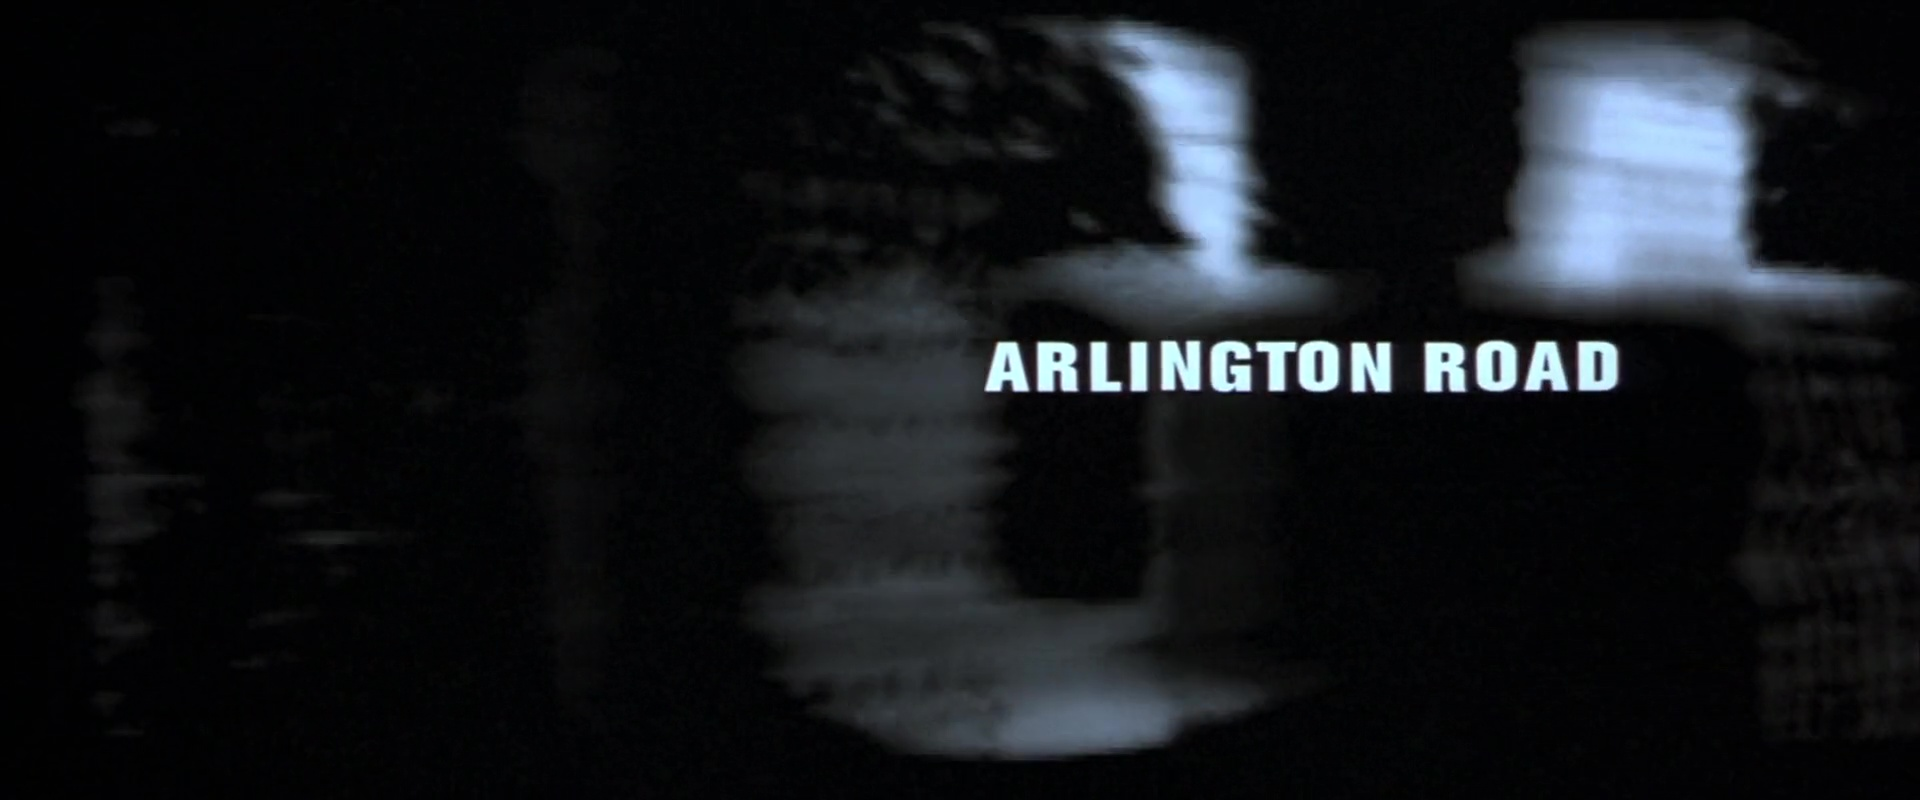 ARLINGTON ROAD de Mark Pellington (1999)